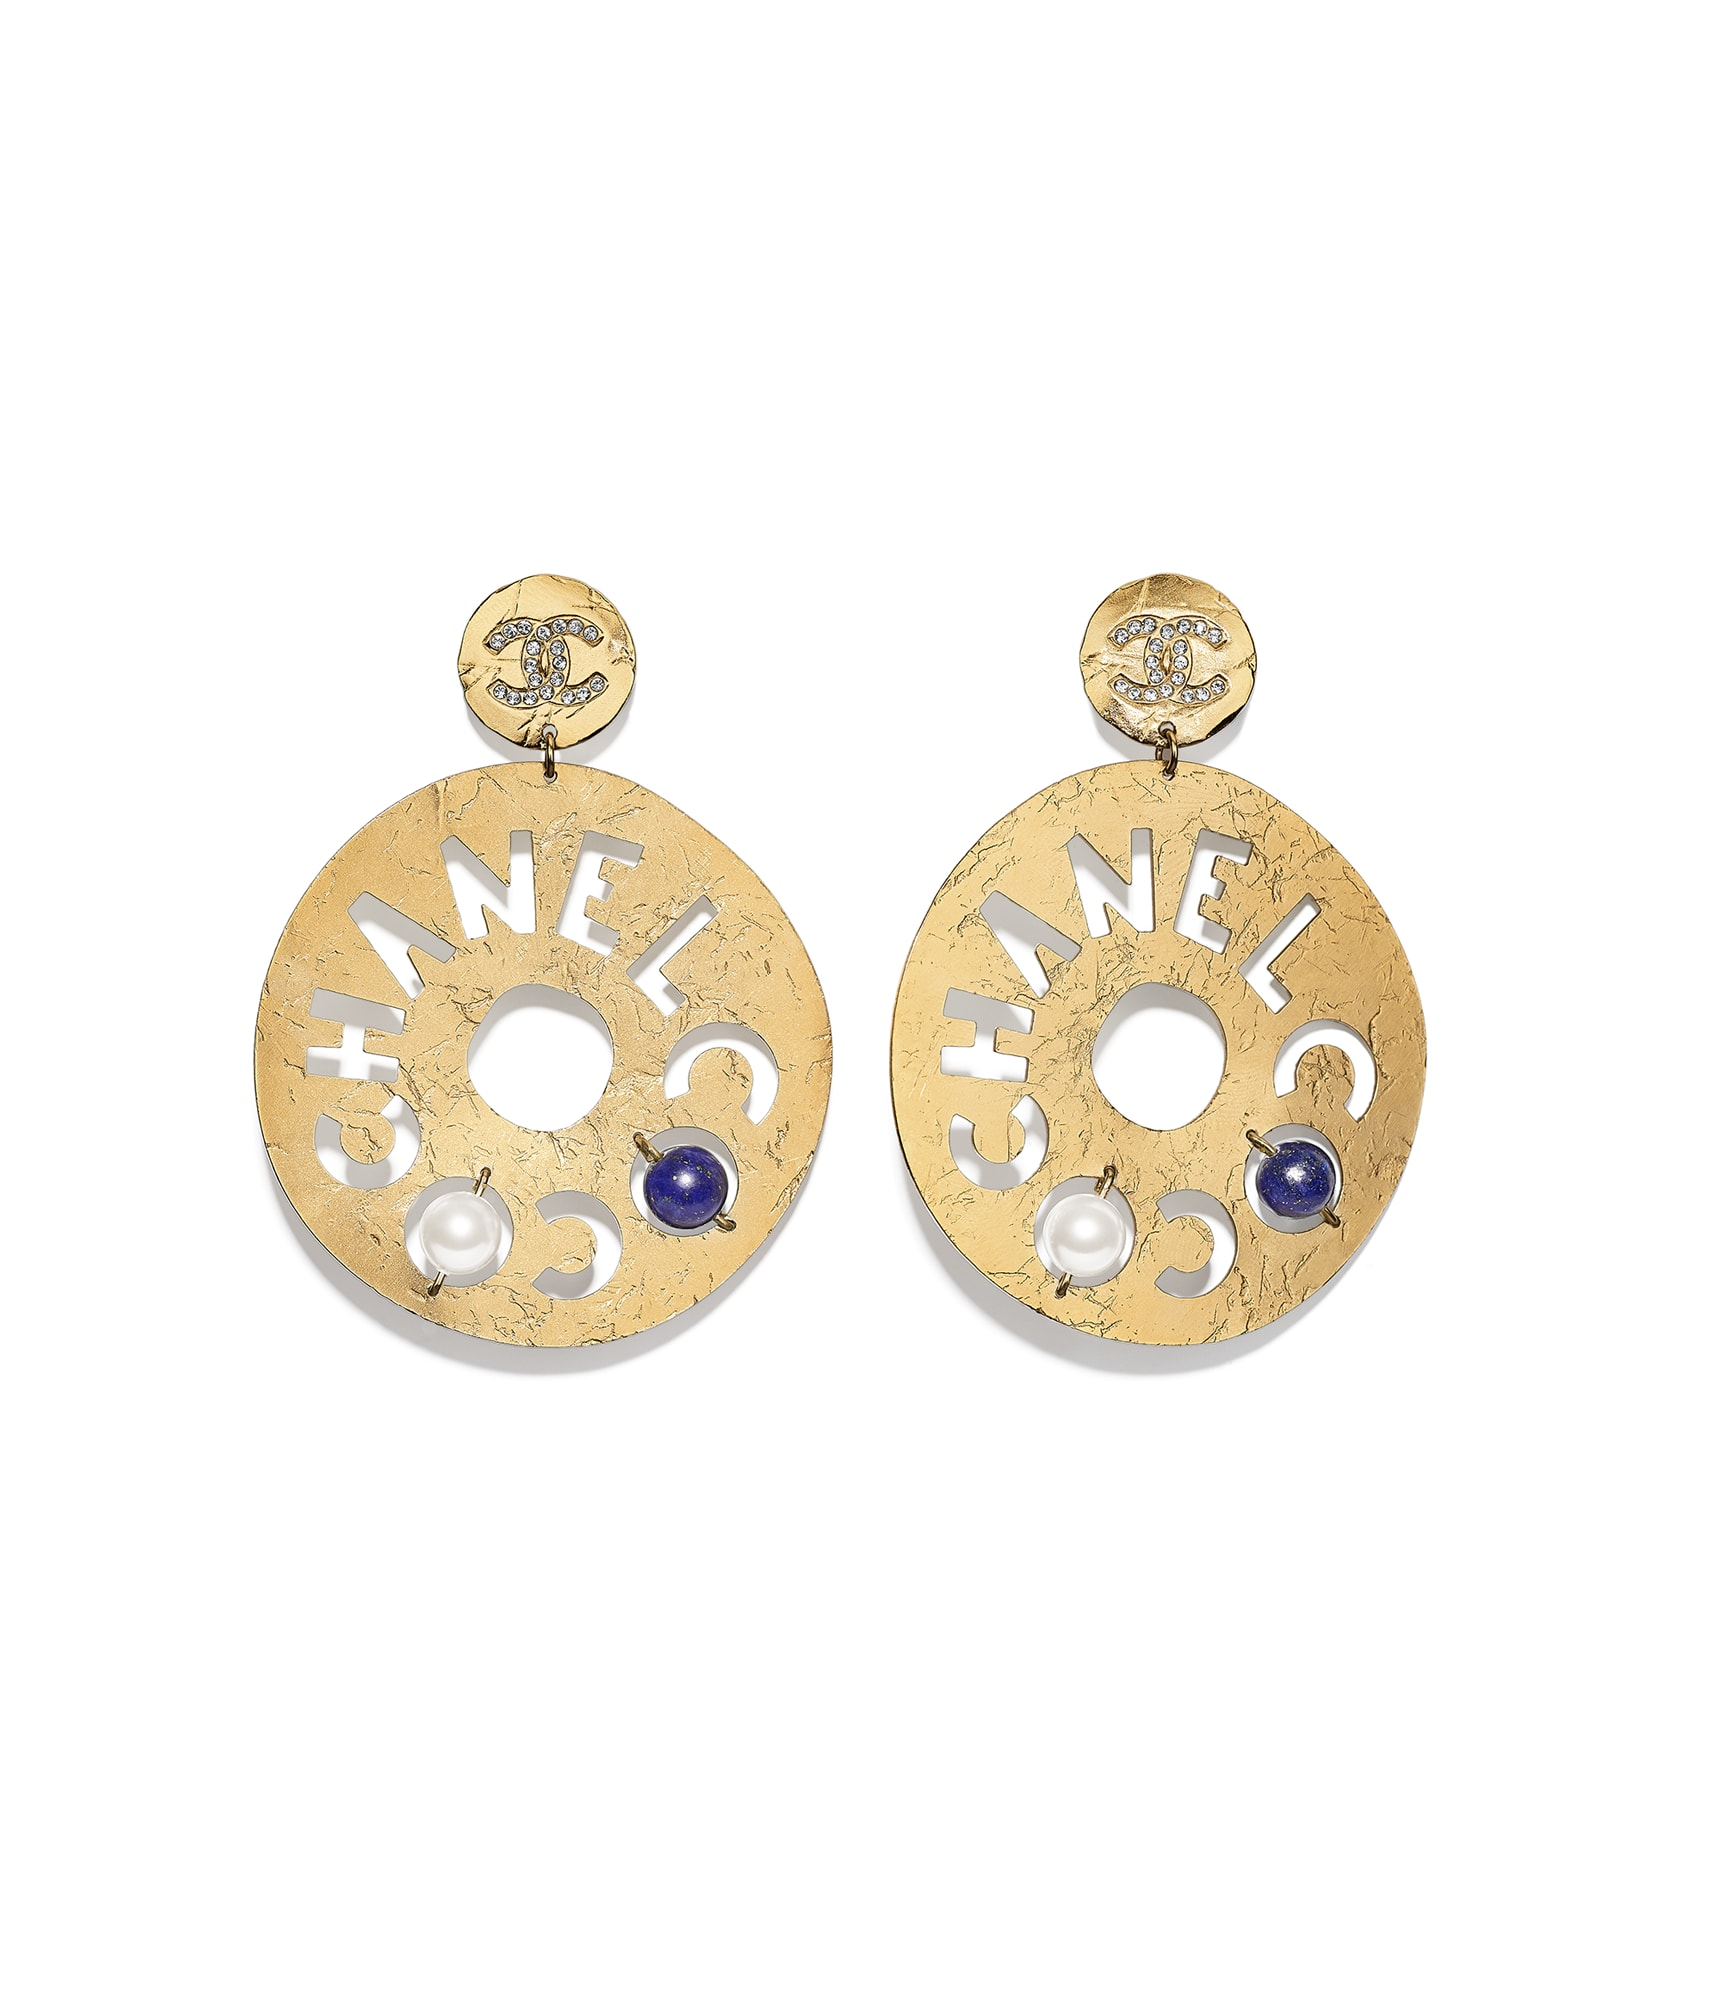 Jewelry & Accessories Earrings High Quatily Simple Large Gold Silver Earrings Big Long Drop Earrings Irregular Circles Dangle Earring For Women Fashion Jewelry